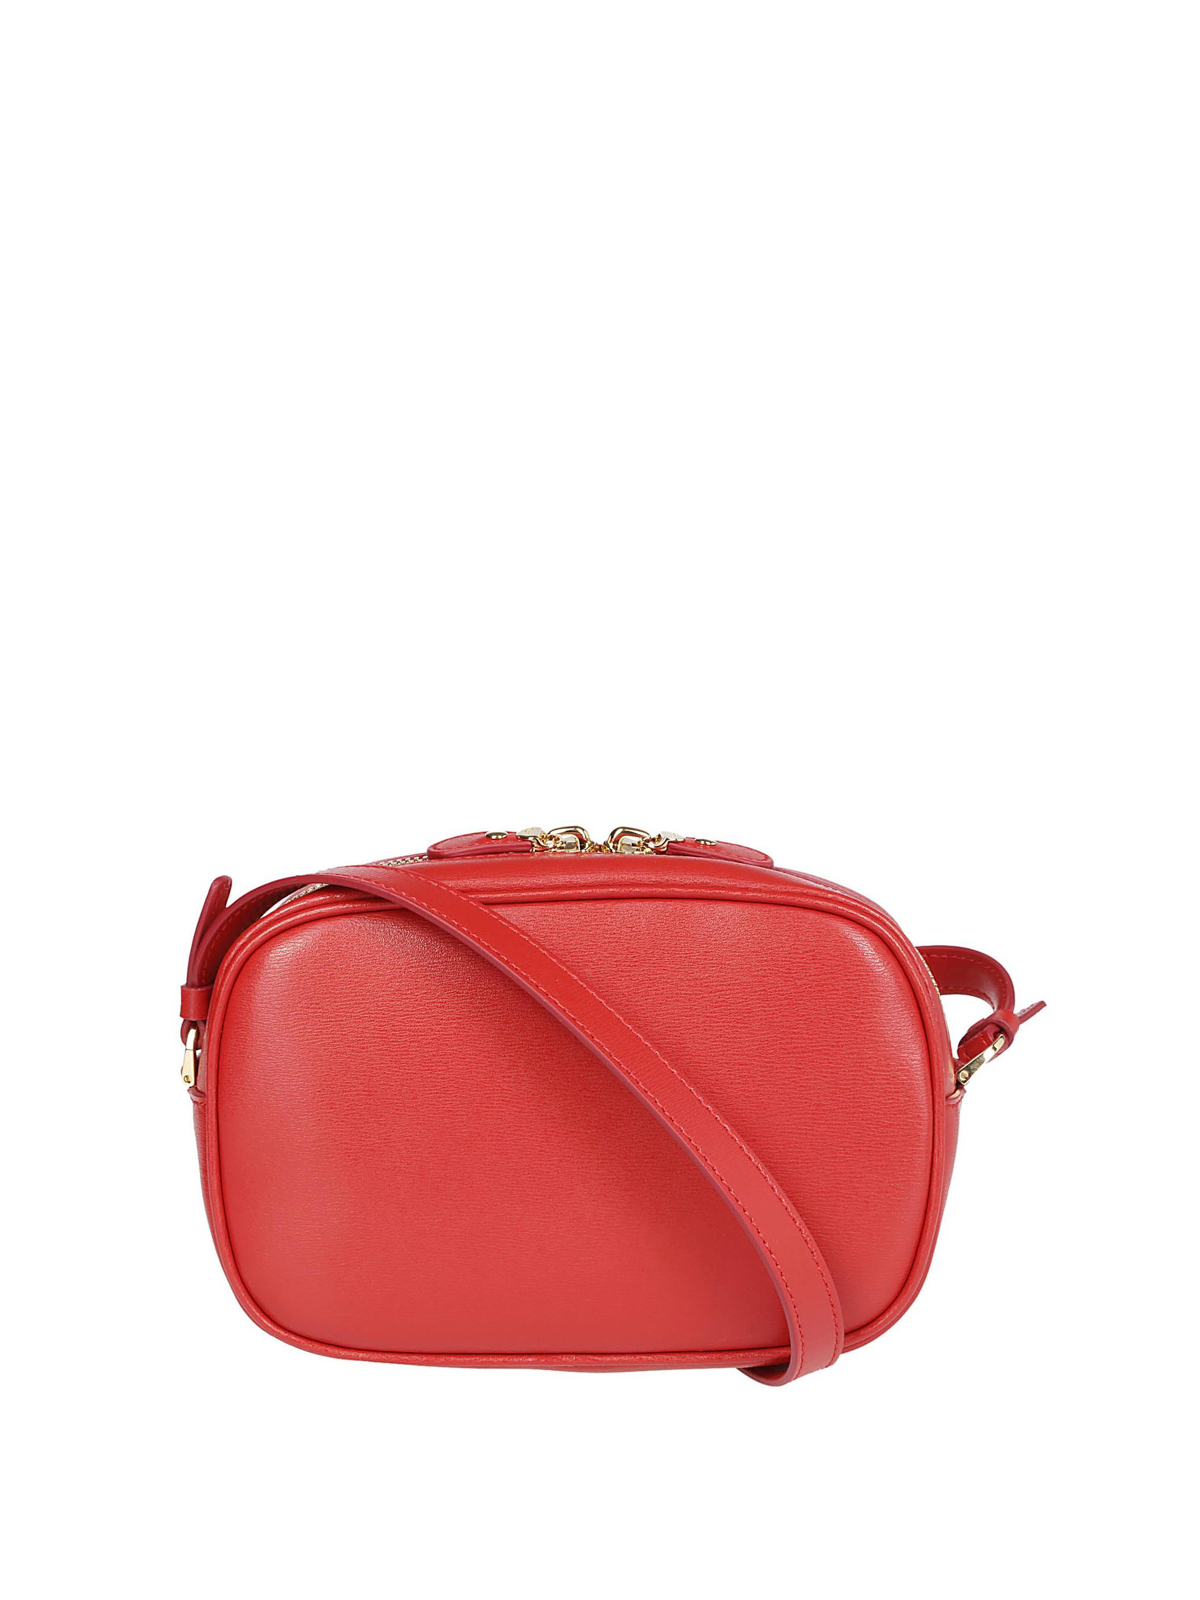 060031b32a iKRIX SALVATORE FERRAGAMO  cross body bags - Gancini lipstick calfskin  small camera bag